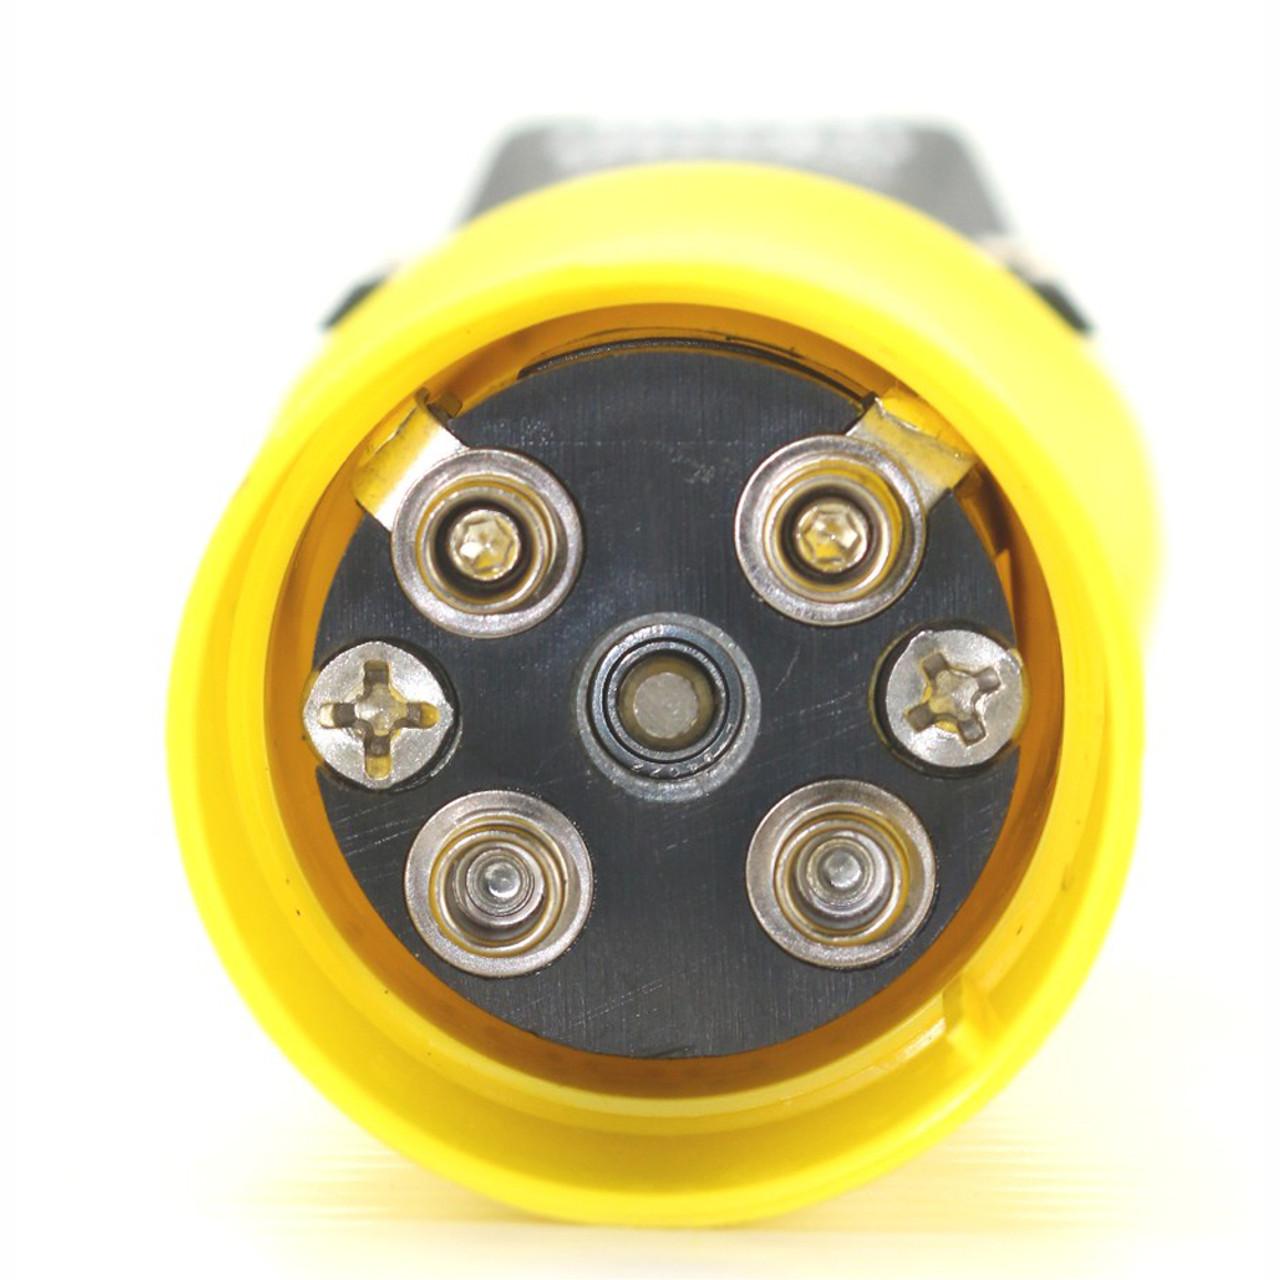 Laube Mini Micro 721 hand piece motor view